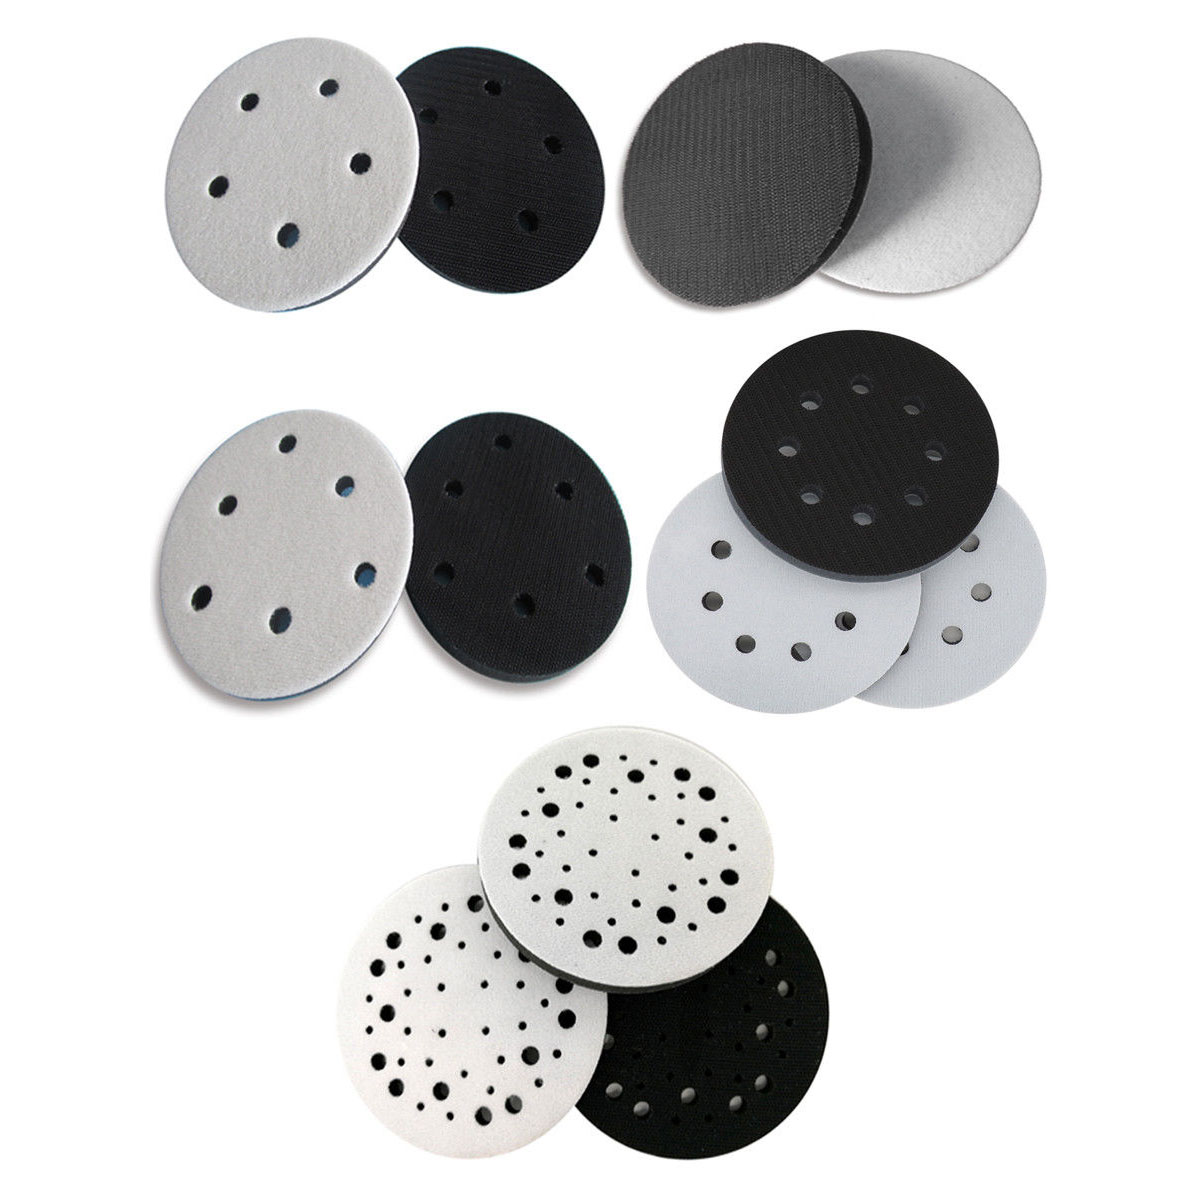 1-10Pcs 5 Inch 125mm Soft Sponge Interface Pad For Sander Backing Pads Hook&Loop Sanding Discs Abrasive Tools